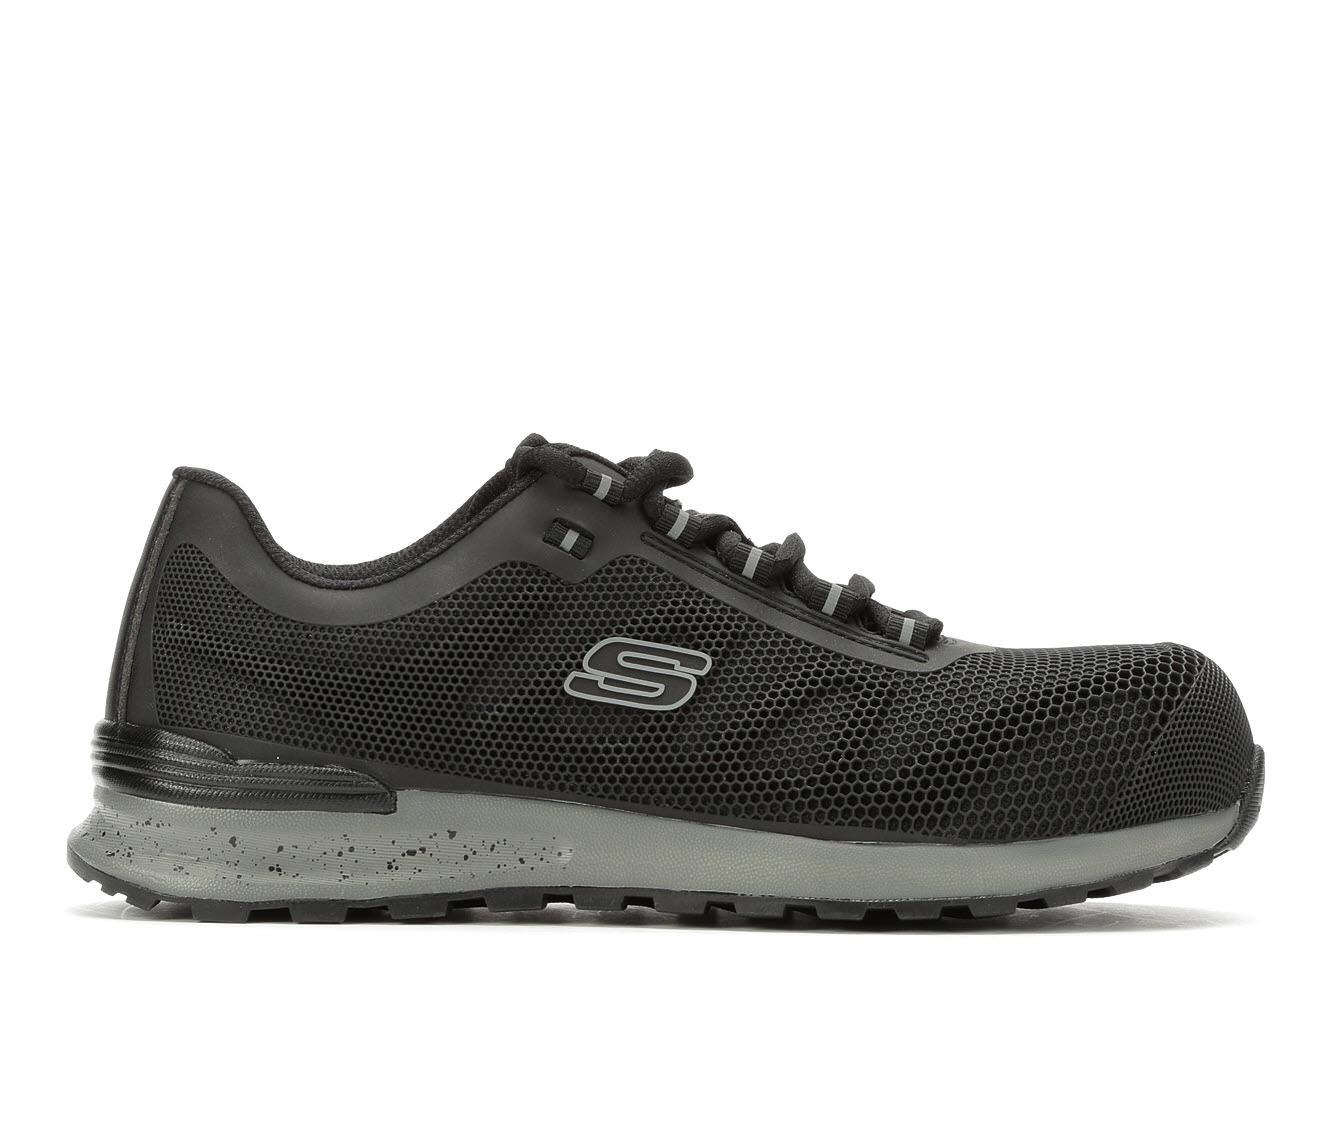 Skechers Work Bulkin 77180 Composite Toe Men's Boots (Black Leather)